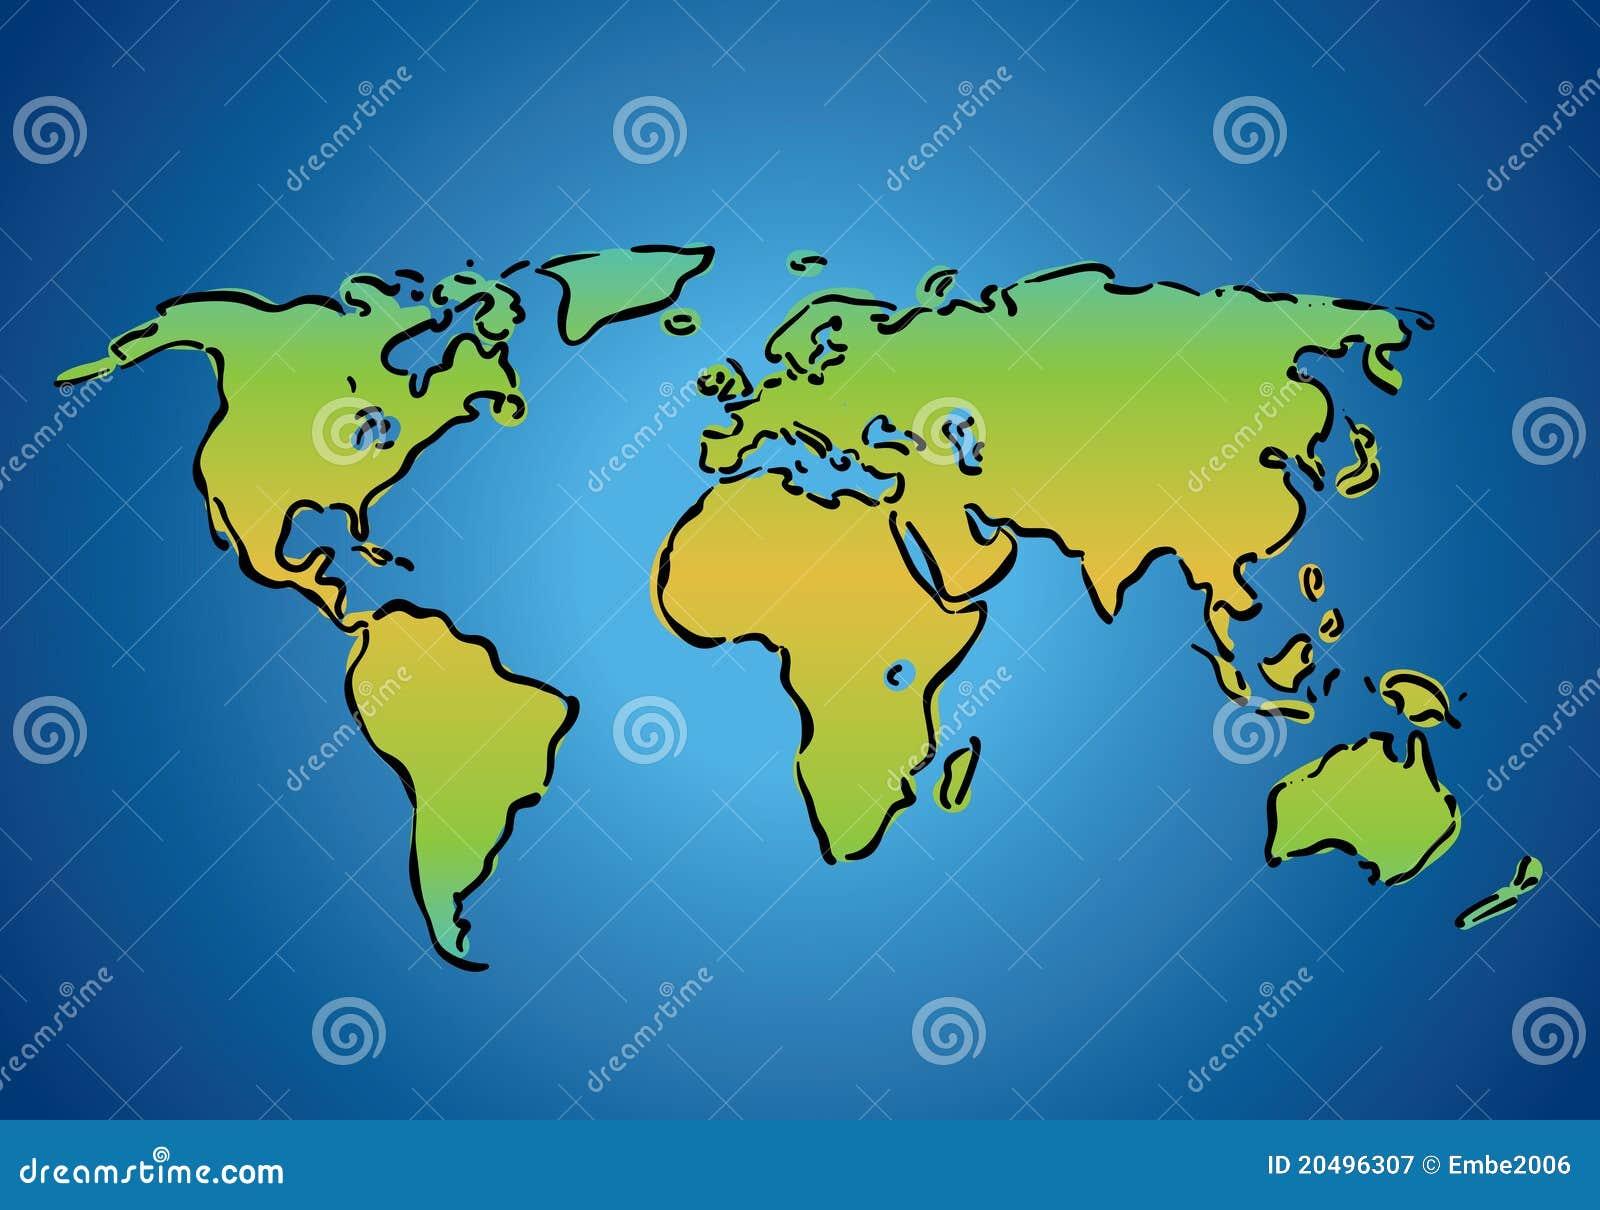 Einfache weltkarte lizenzfreie stockfotografie bild - Papel pintado mapa del mundo ...